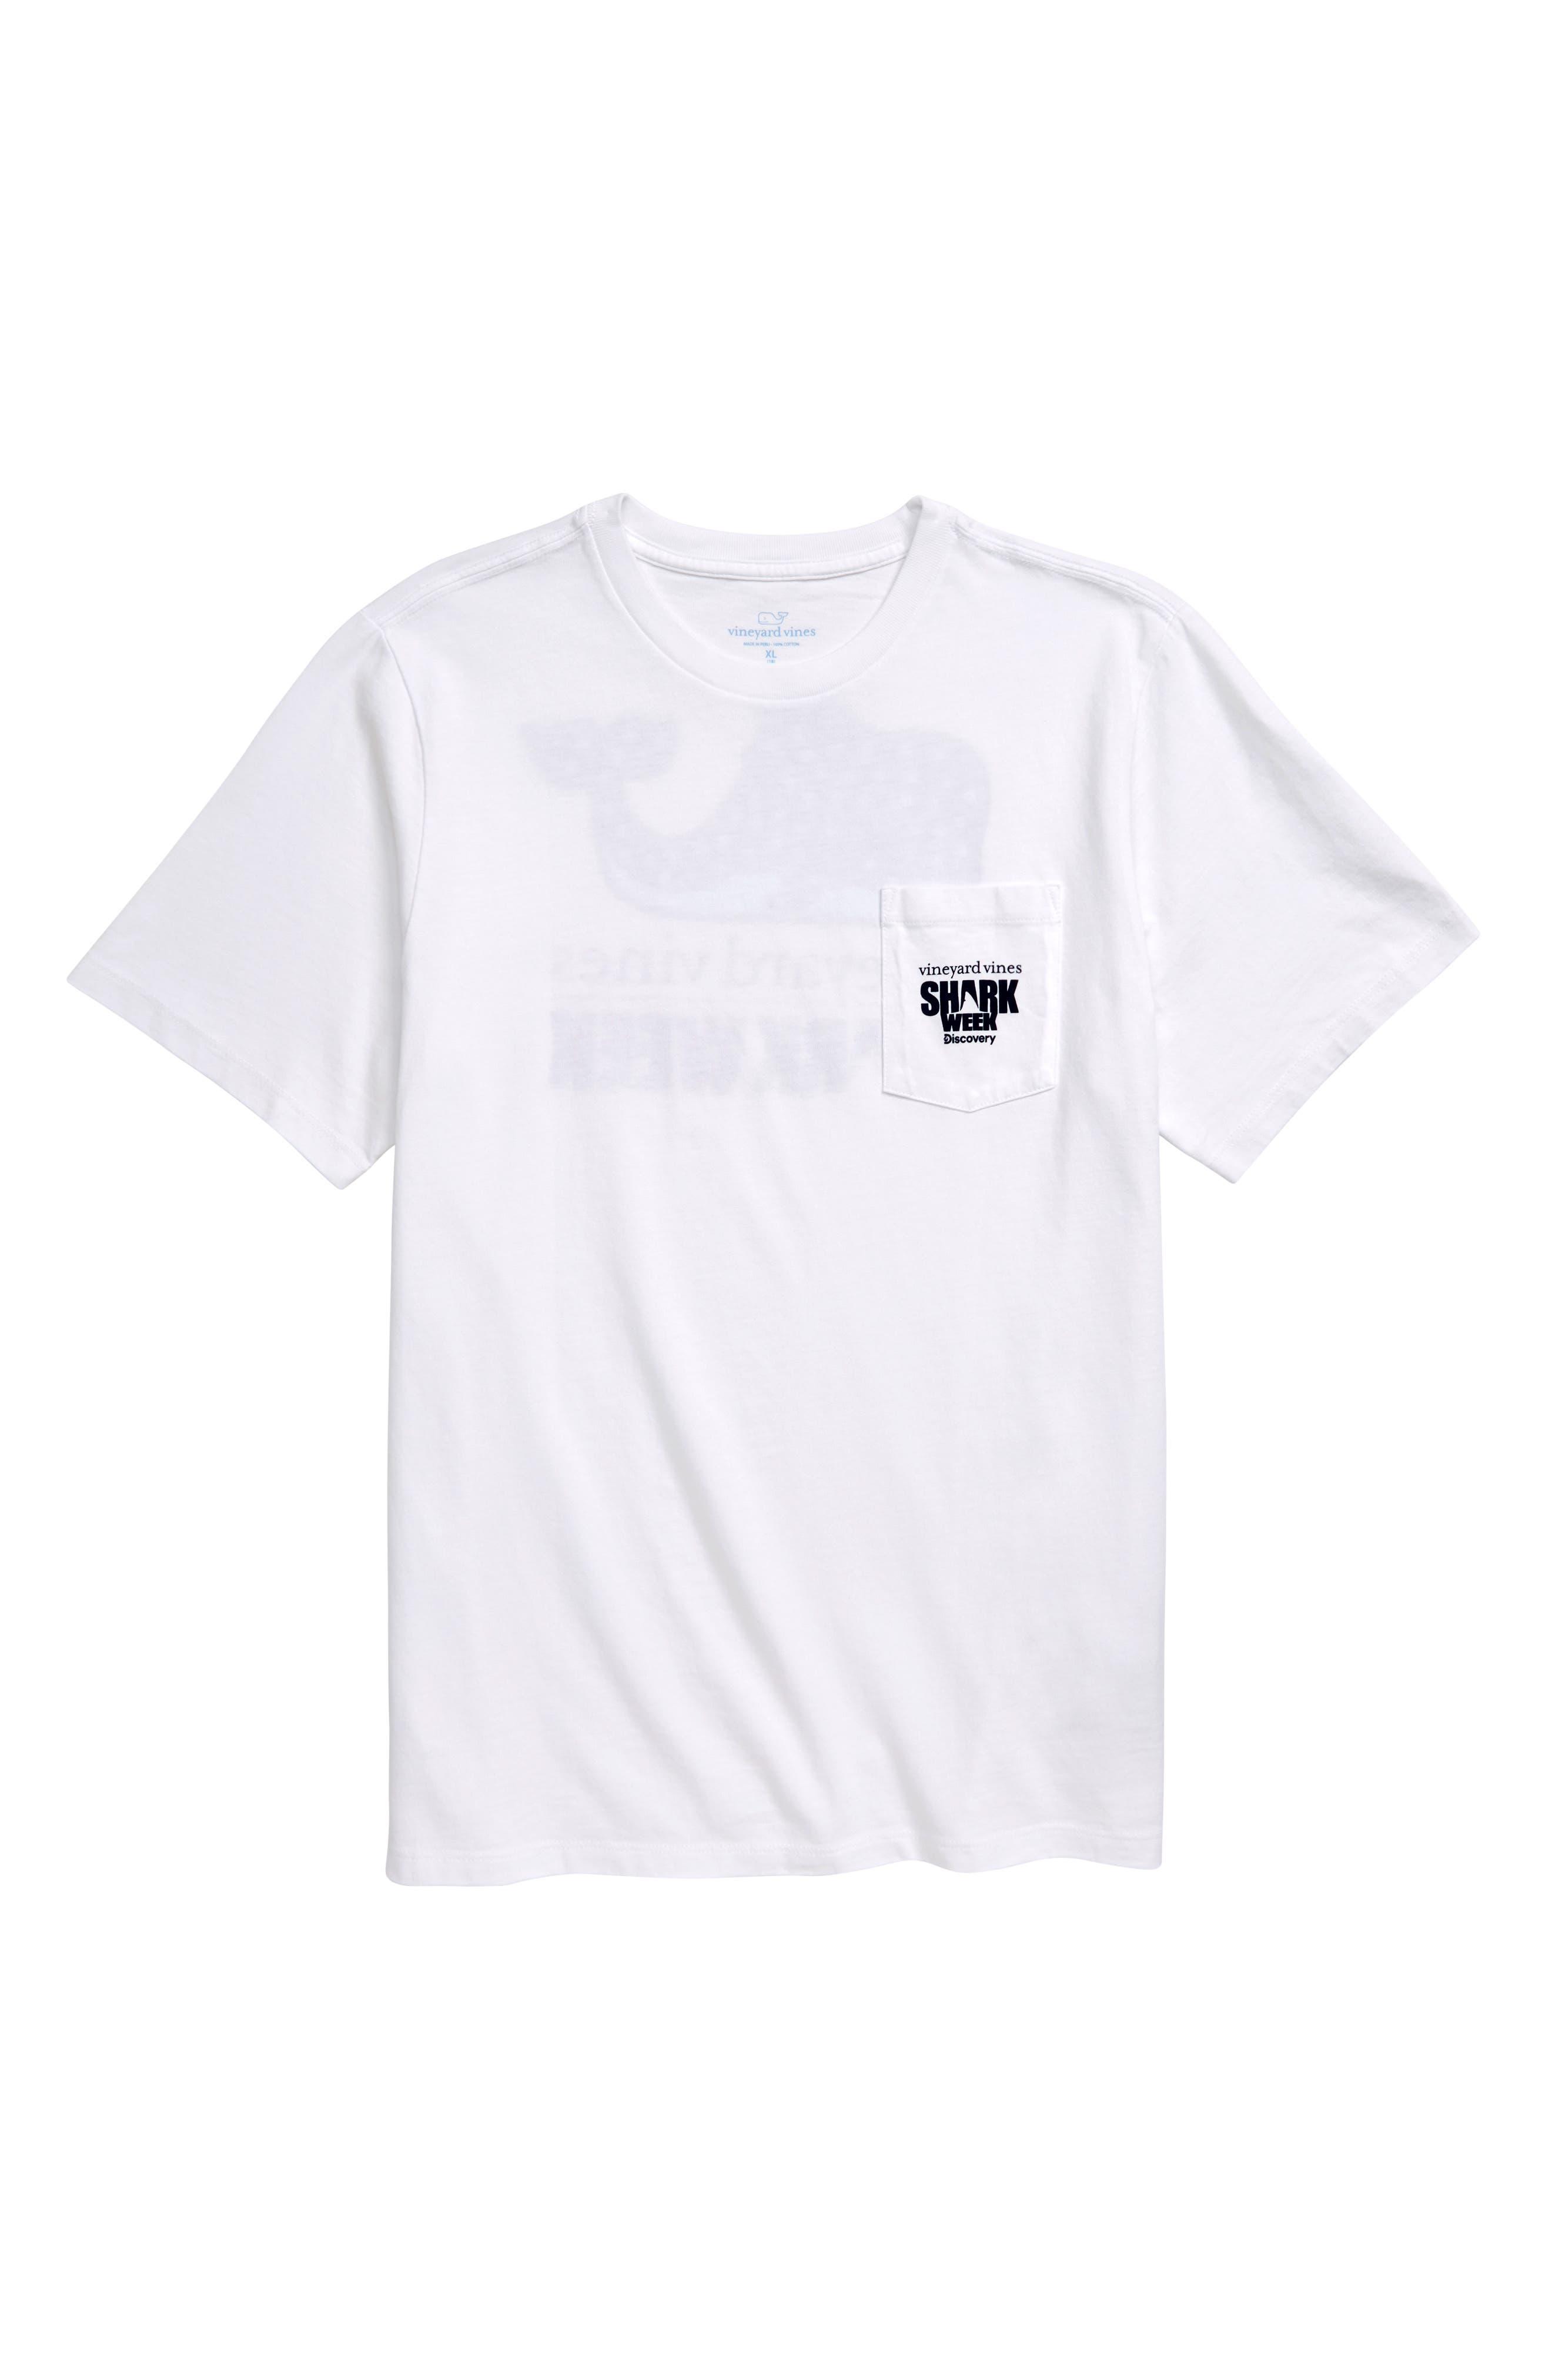 Toddler Boys Vineyard Vines X Shark Week(TM) Whale Shark Pocket TShirt Size 3T  White